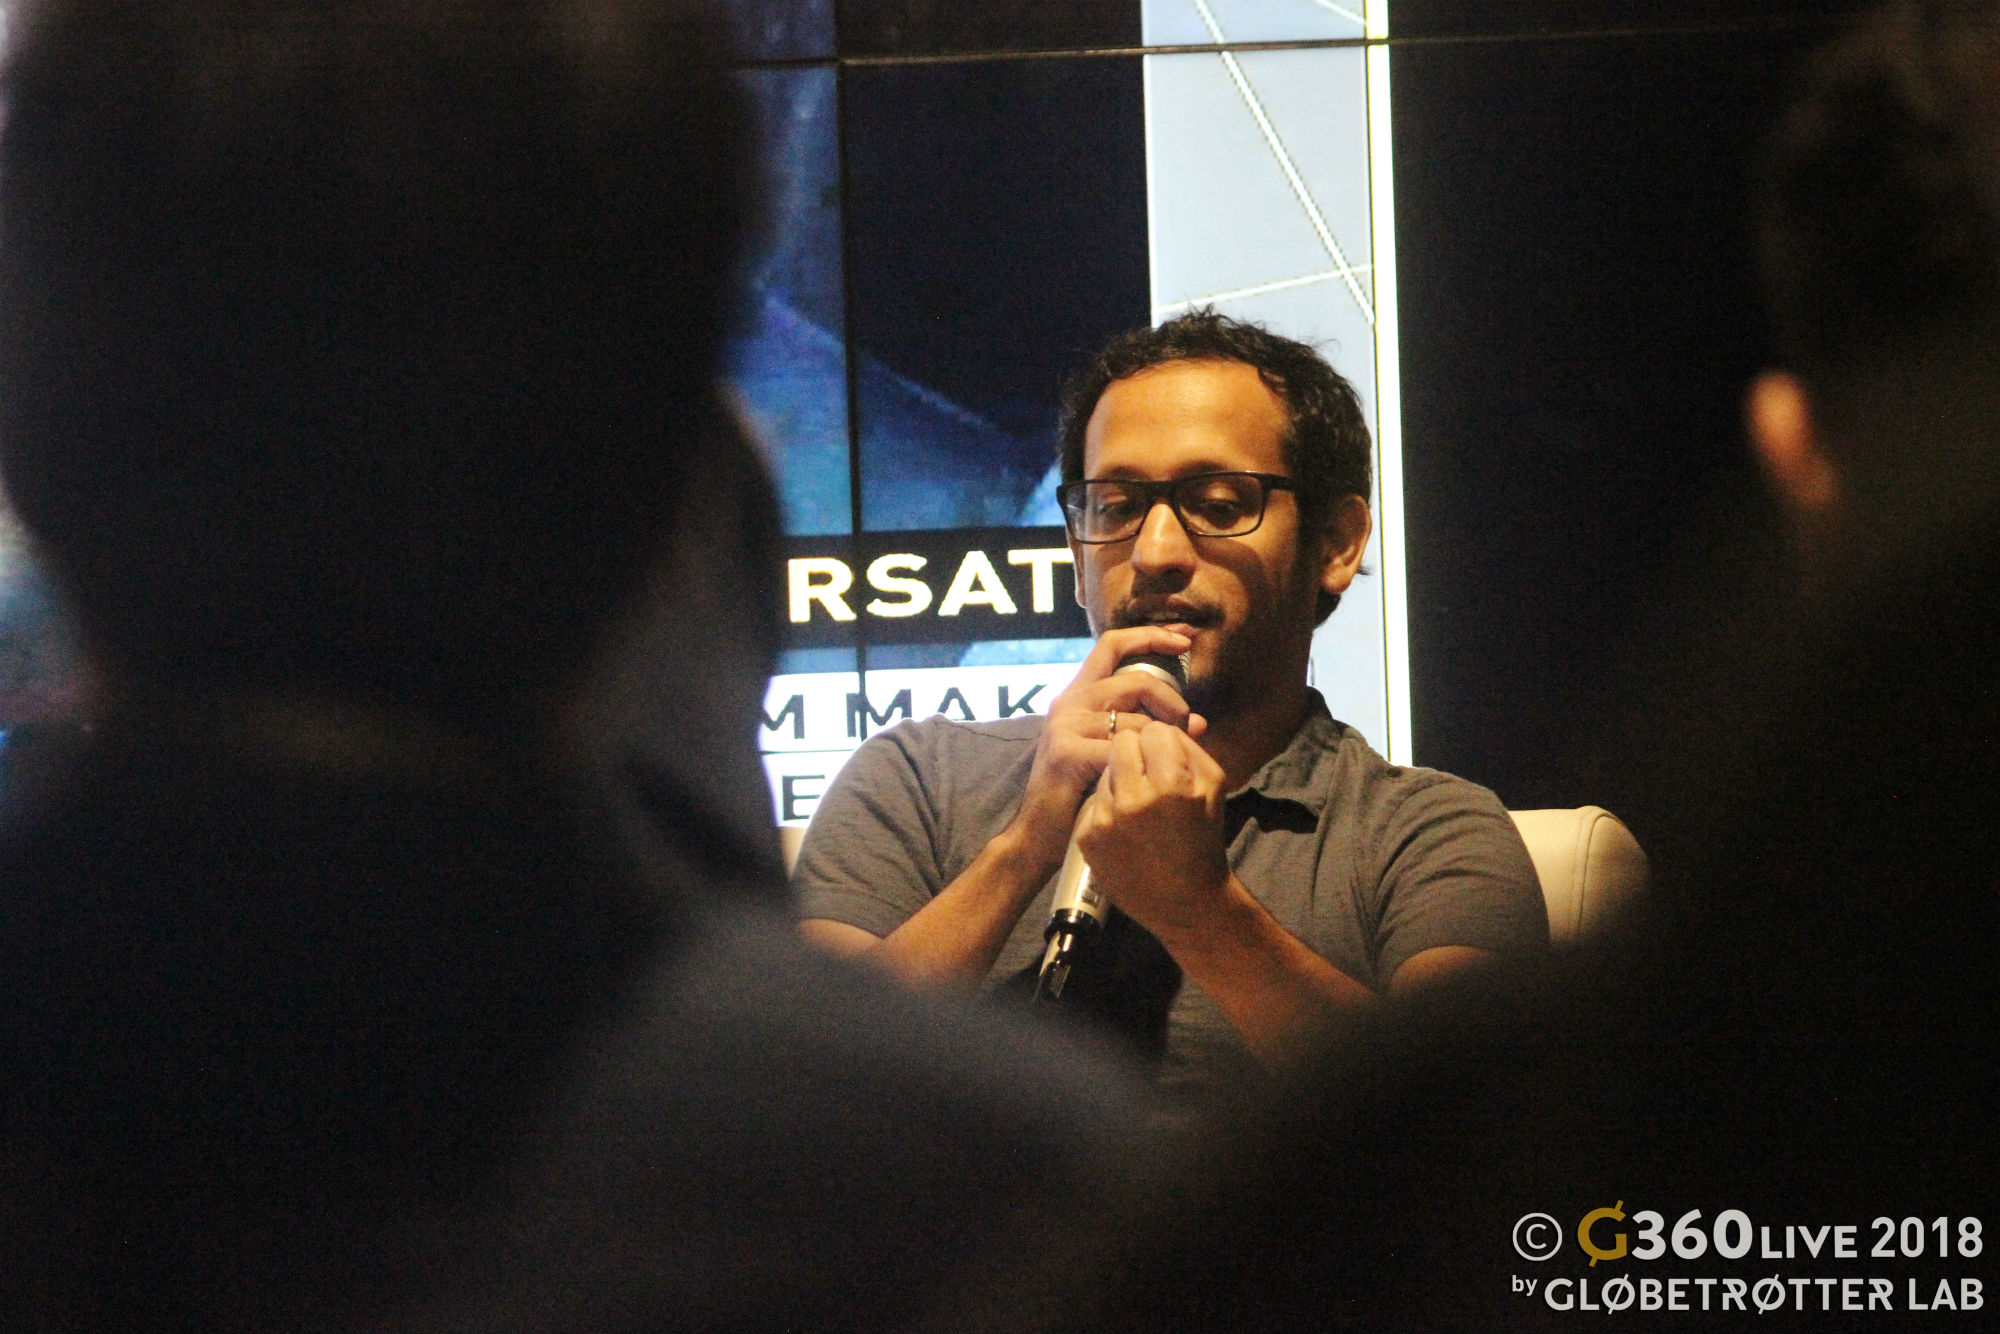 Nadiem Makarim, CEO/Founder of Go-Jek Indonesia